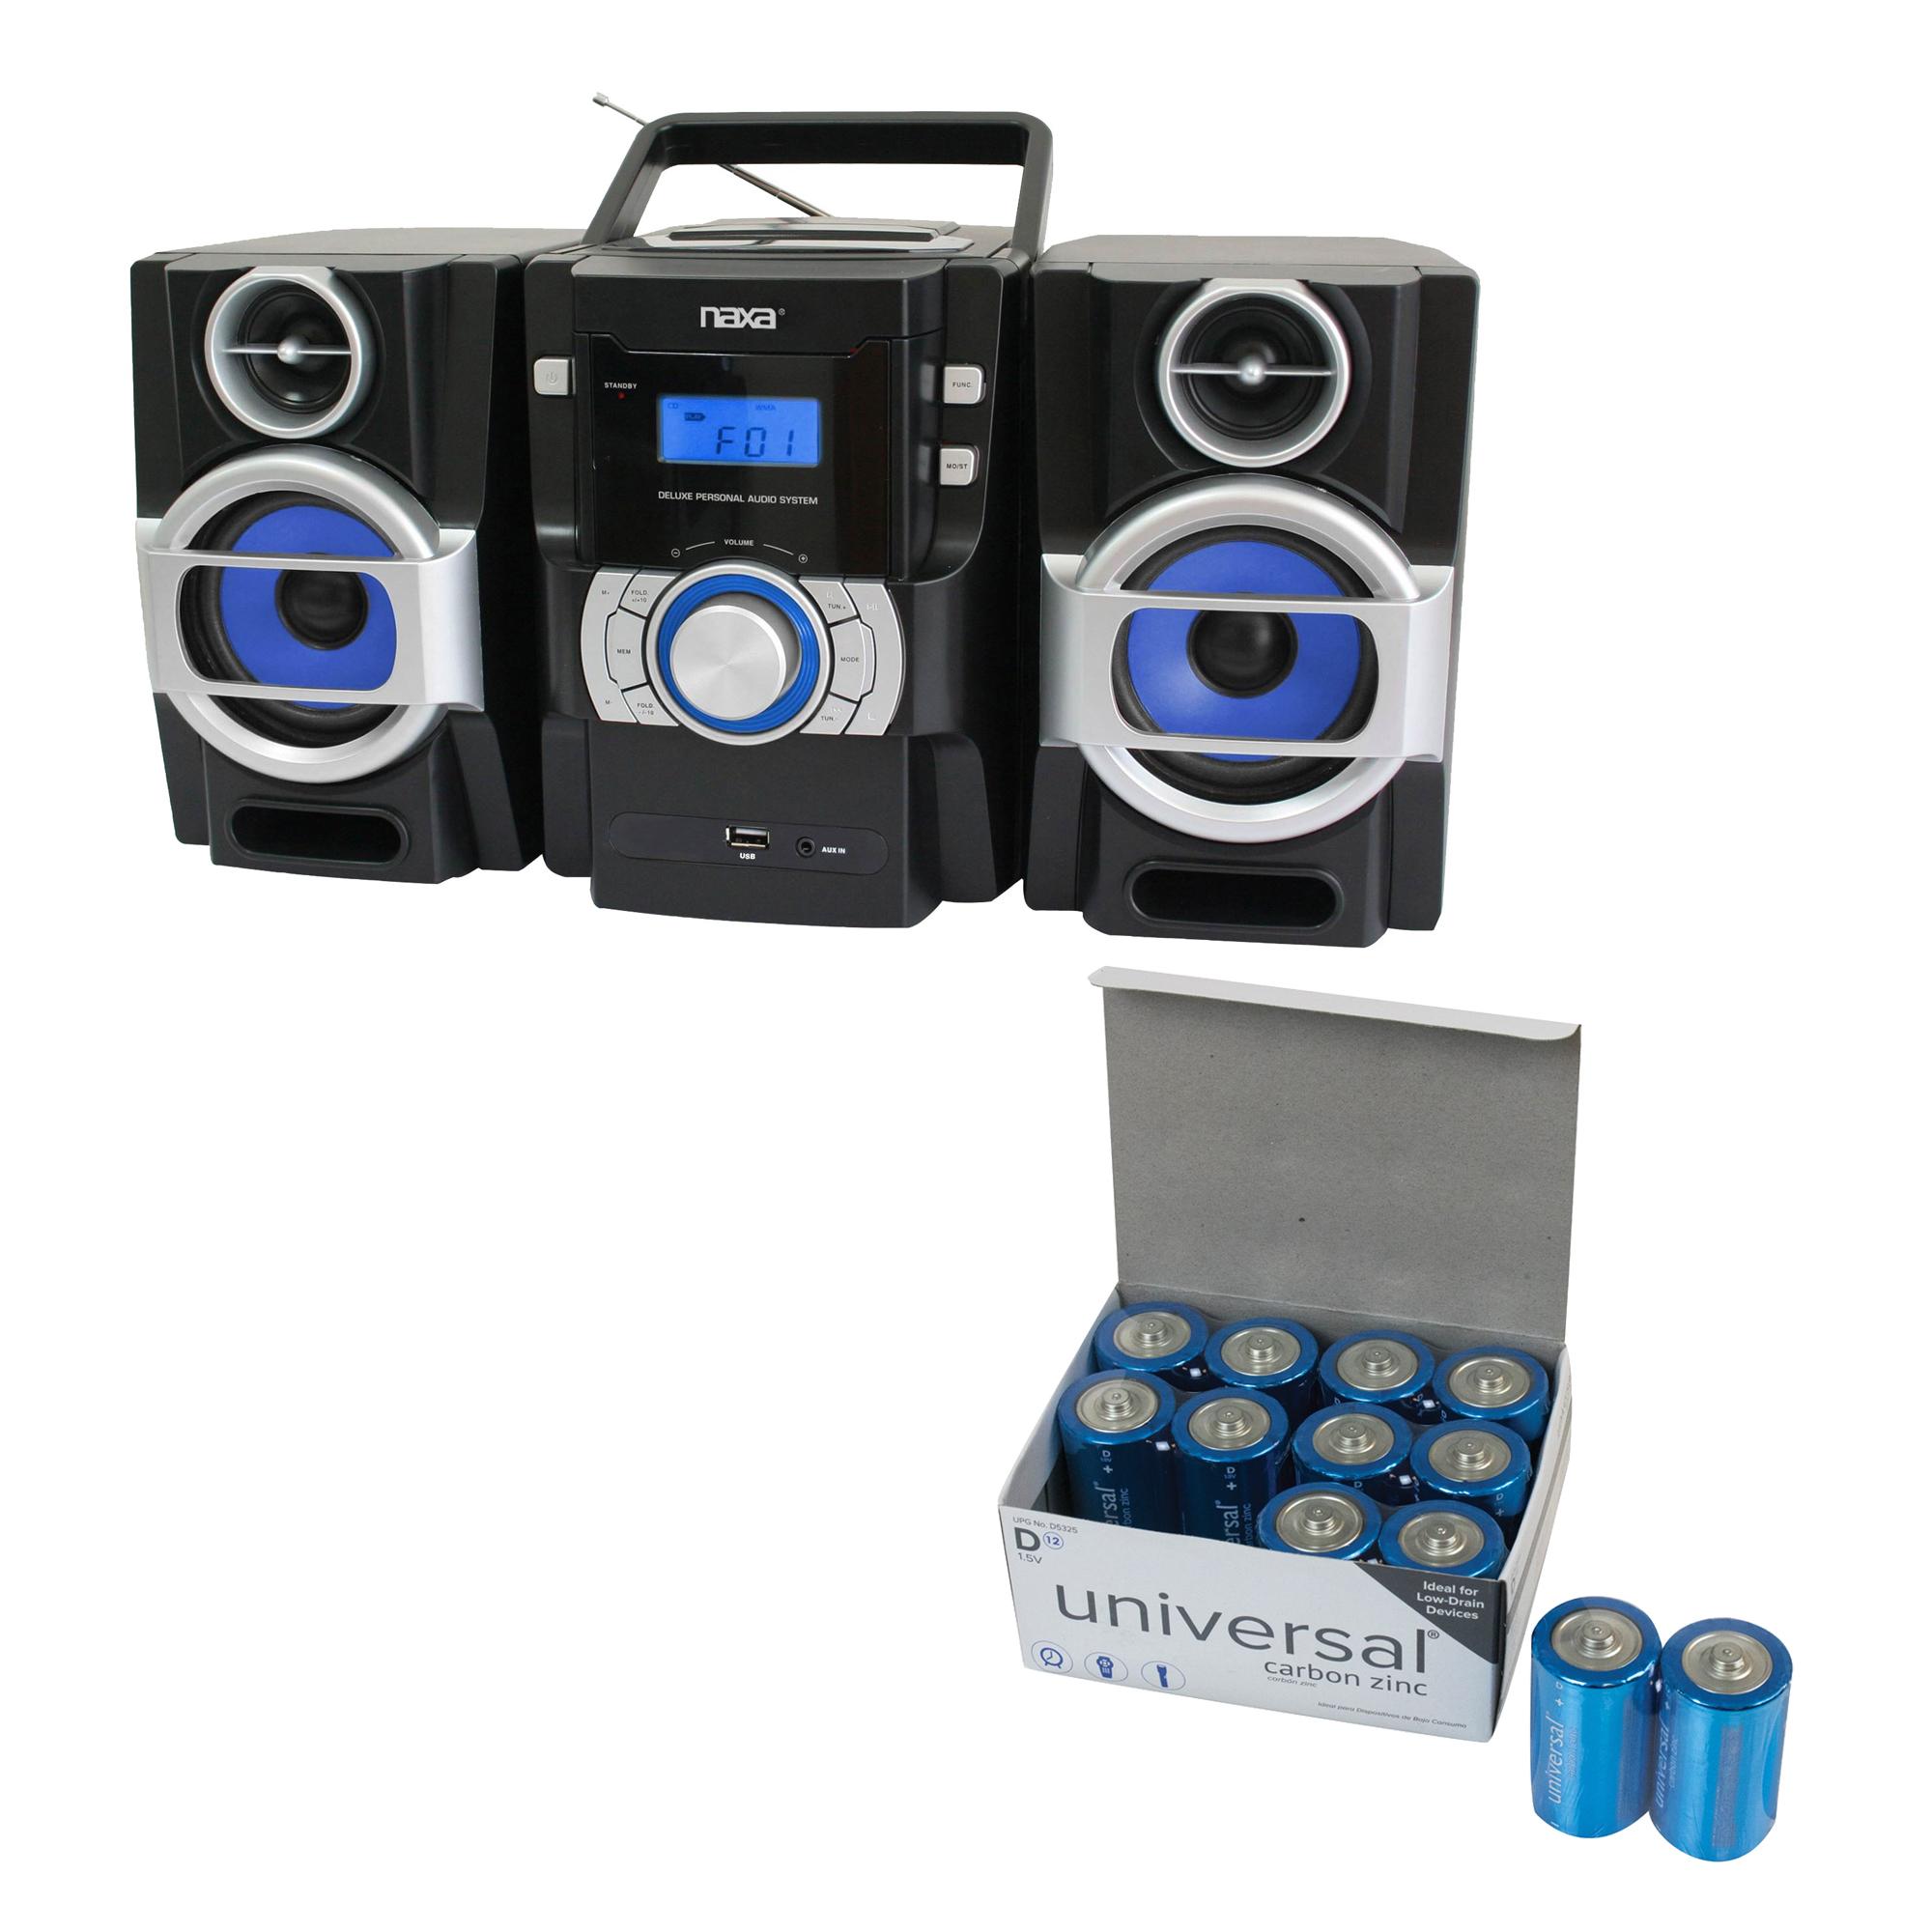 Naxa NPB429 Portable CD/MP3 Player With PLL FM Radio, Detachable Speakers & Remote & UPG D 12 PACK